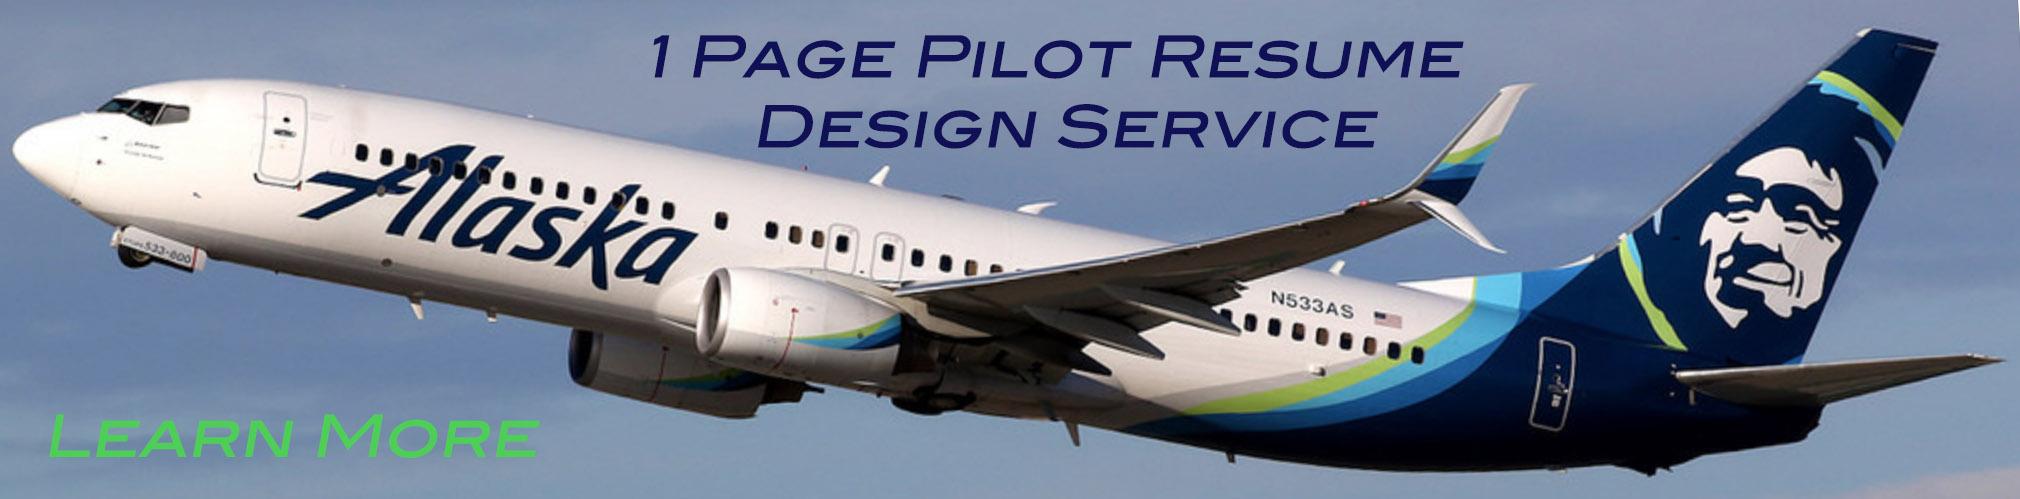 Boeing 737 Information - PILOT CAREER CENTRE